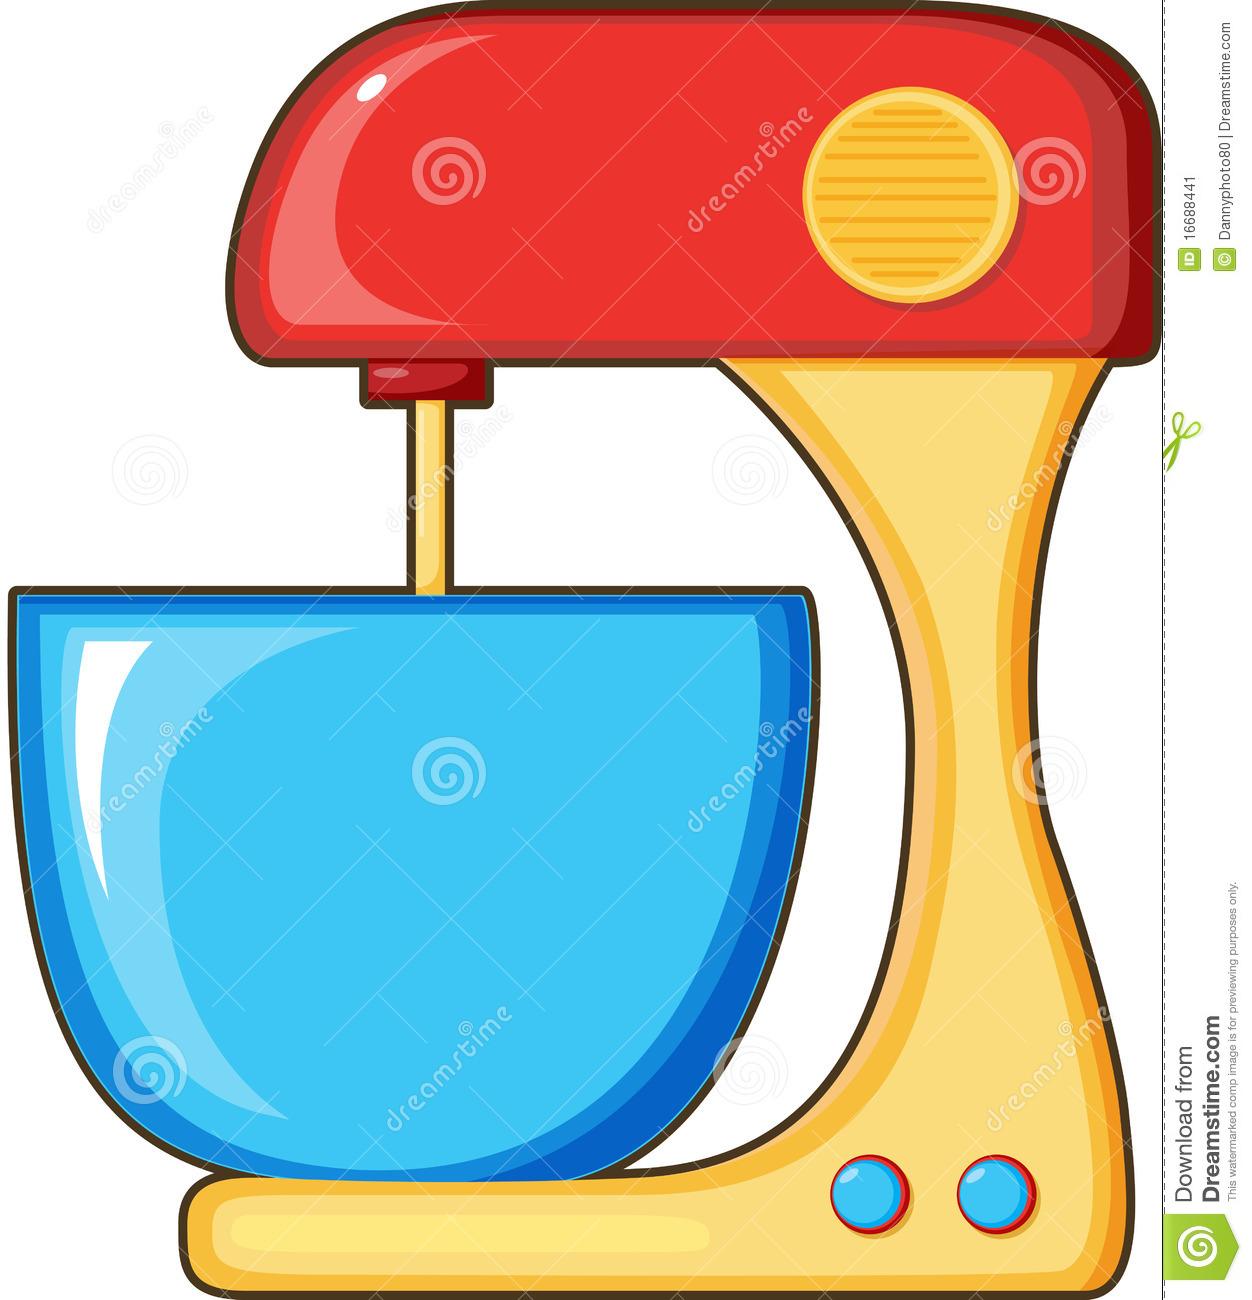 Kitchen appliances clip art. Blender clipart small appliance